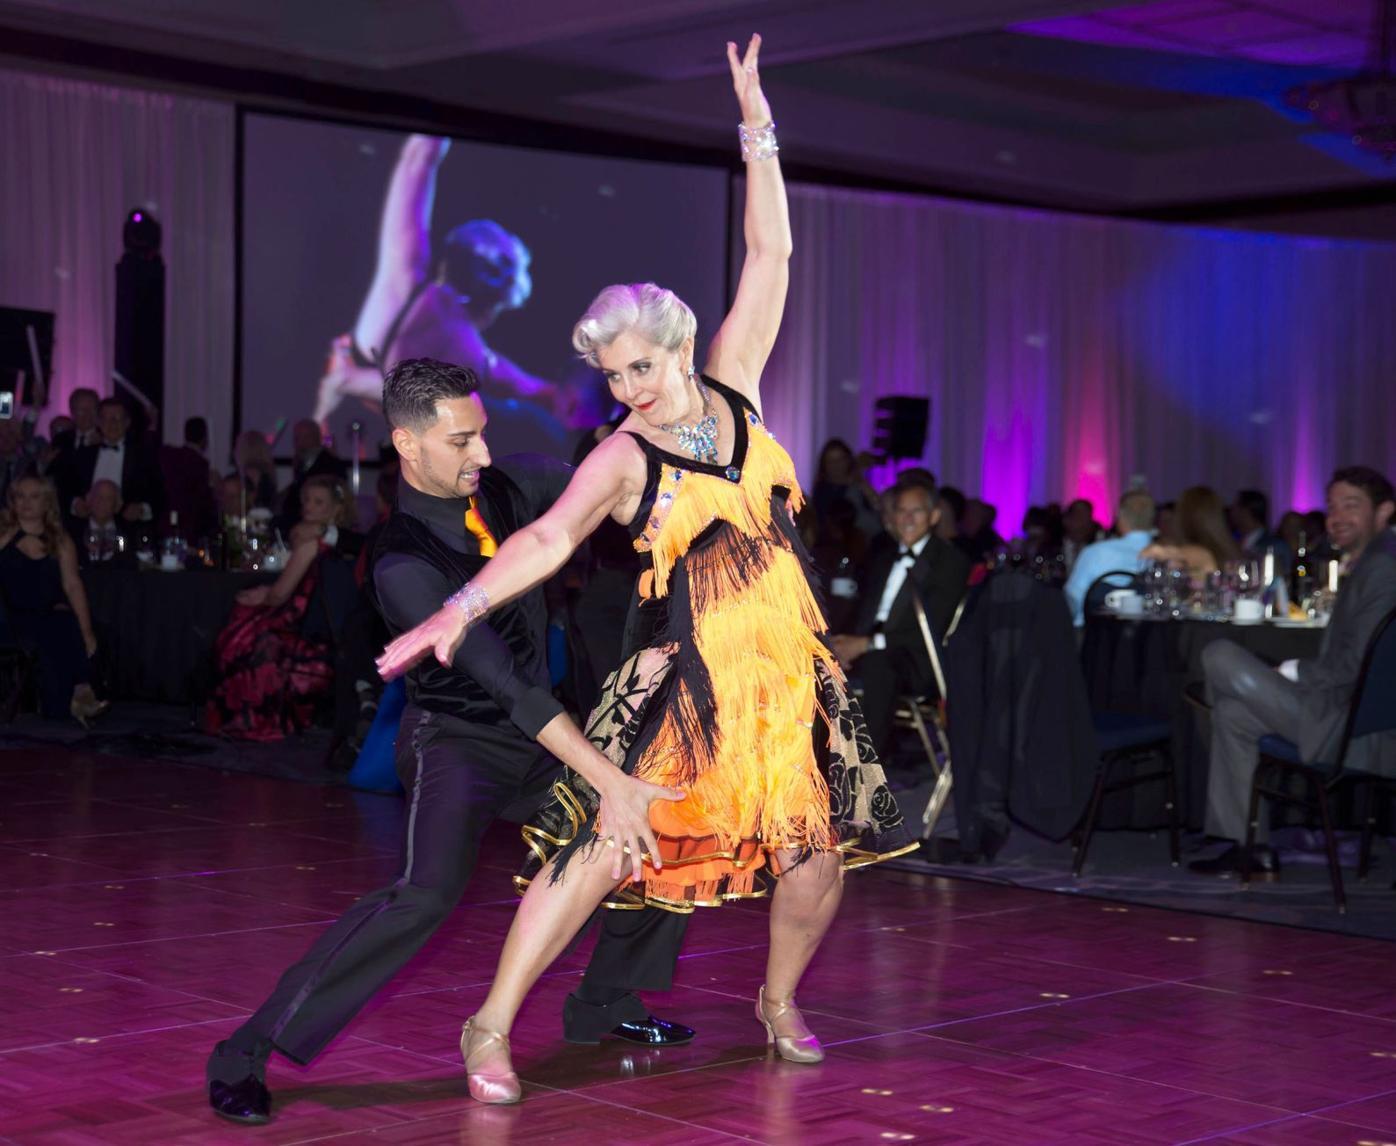 071719_MNS_full_Dancing_Stars_007 imone Maccarrone Sarah Chatel